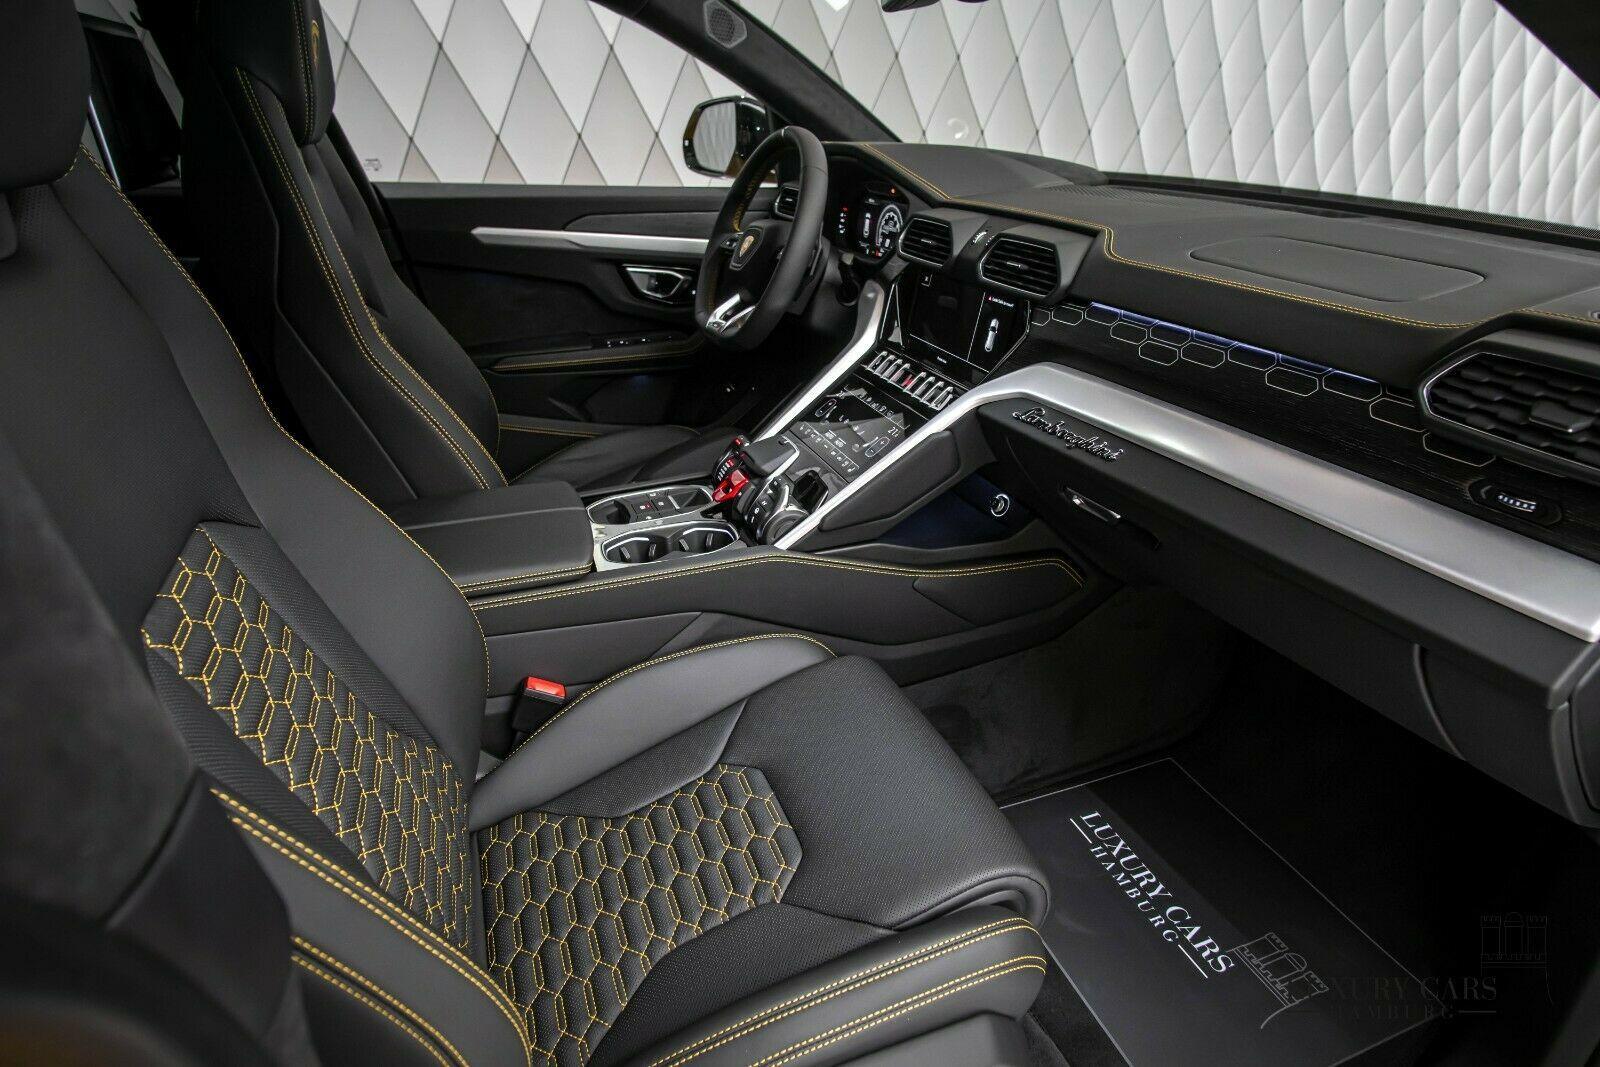 For Sale 2020 Lamborghini Urus Luxury Cars Hamburg United States For Sale On Luxurypulse In 2020 Luxury Cars Lamborghini Luxury Suv